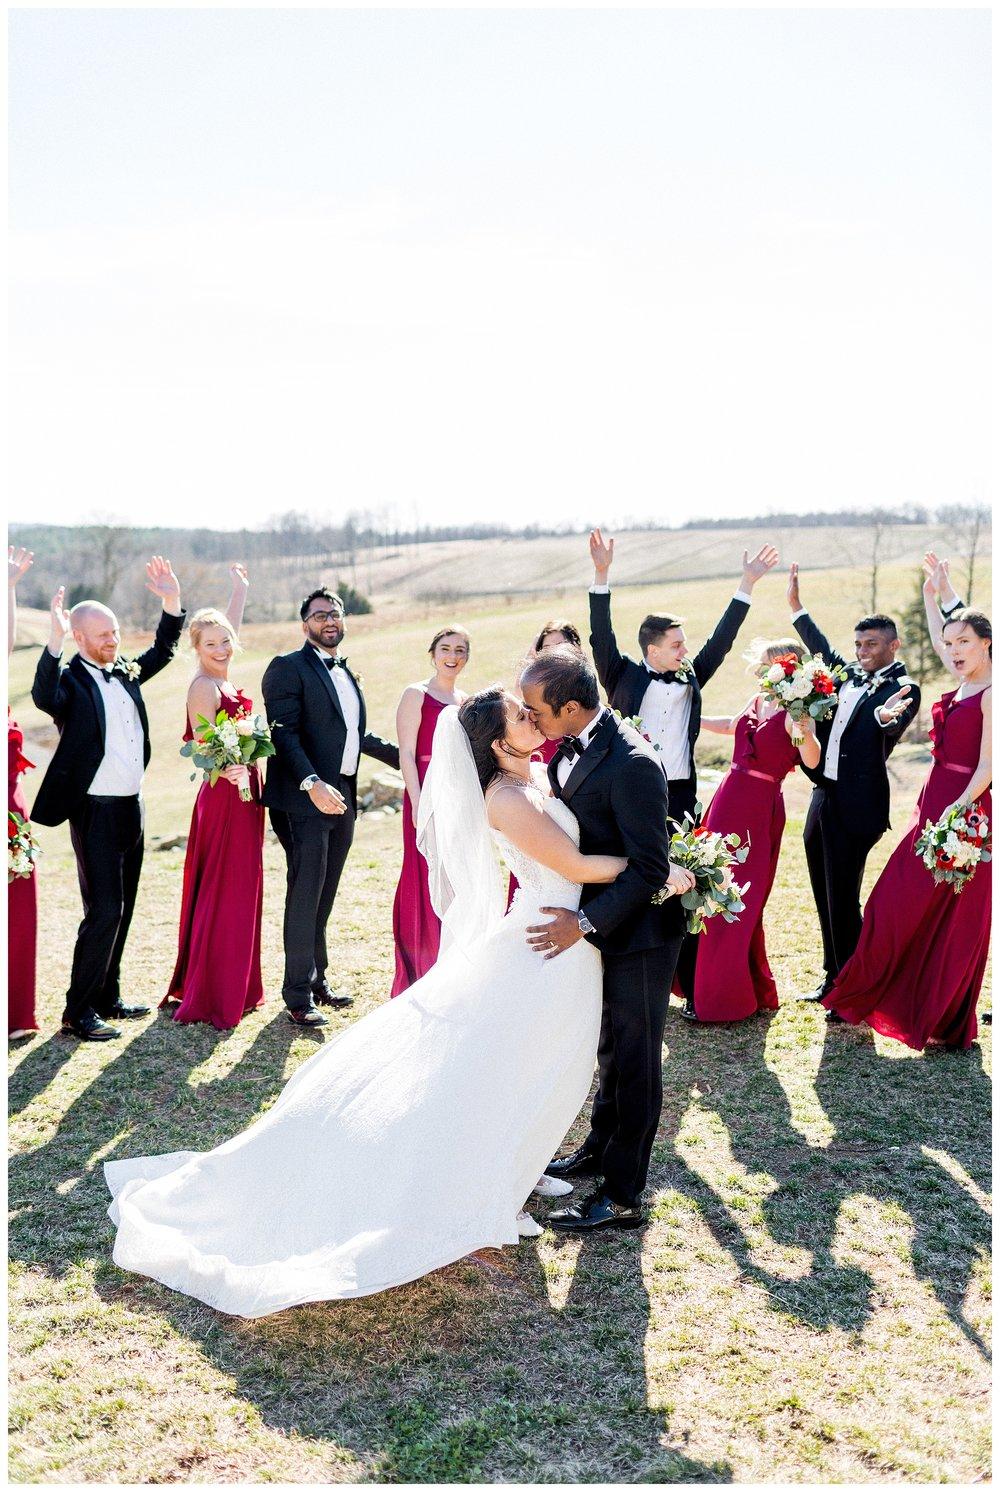 Stone Tower Winery Wedding | Virginia Winter Wedding | VA Wedding Photographer Kir Tuben_0074.jpg